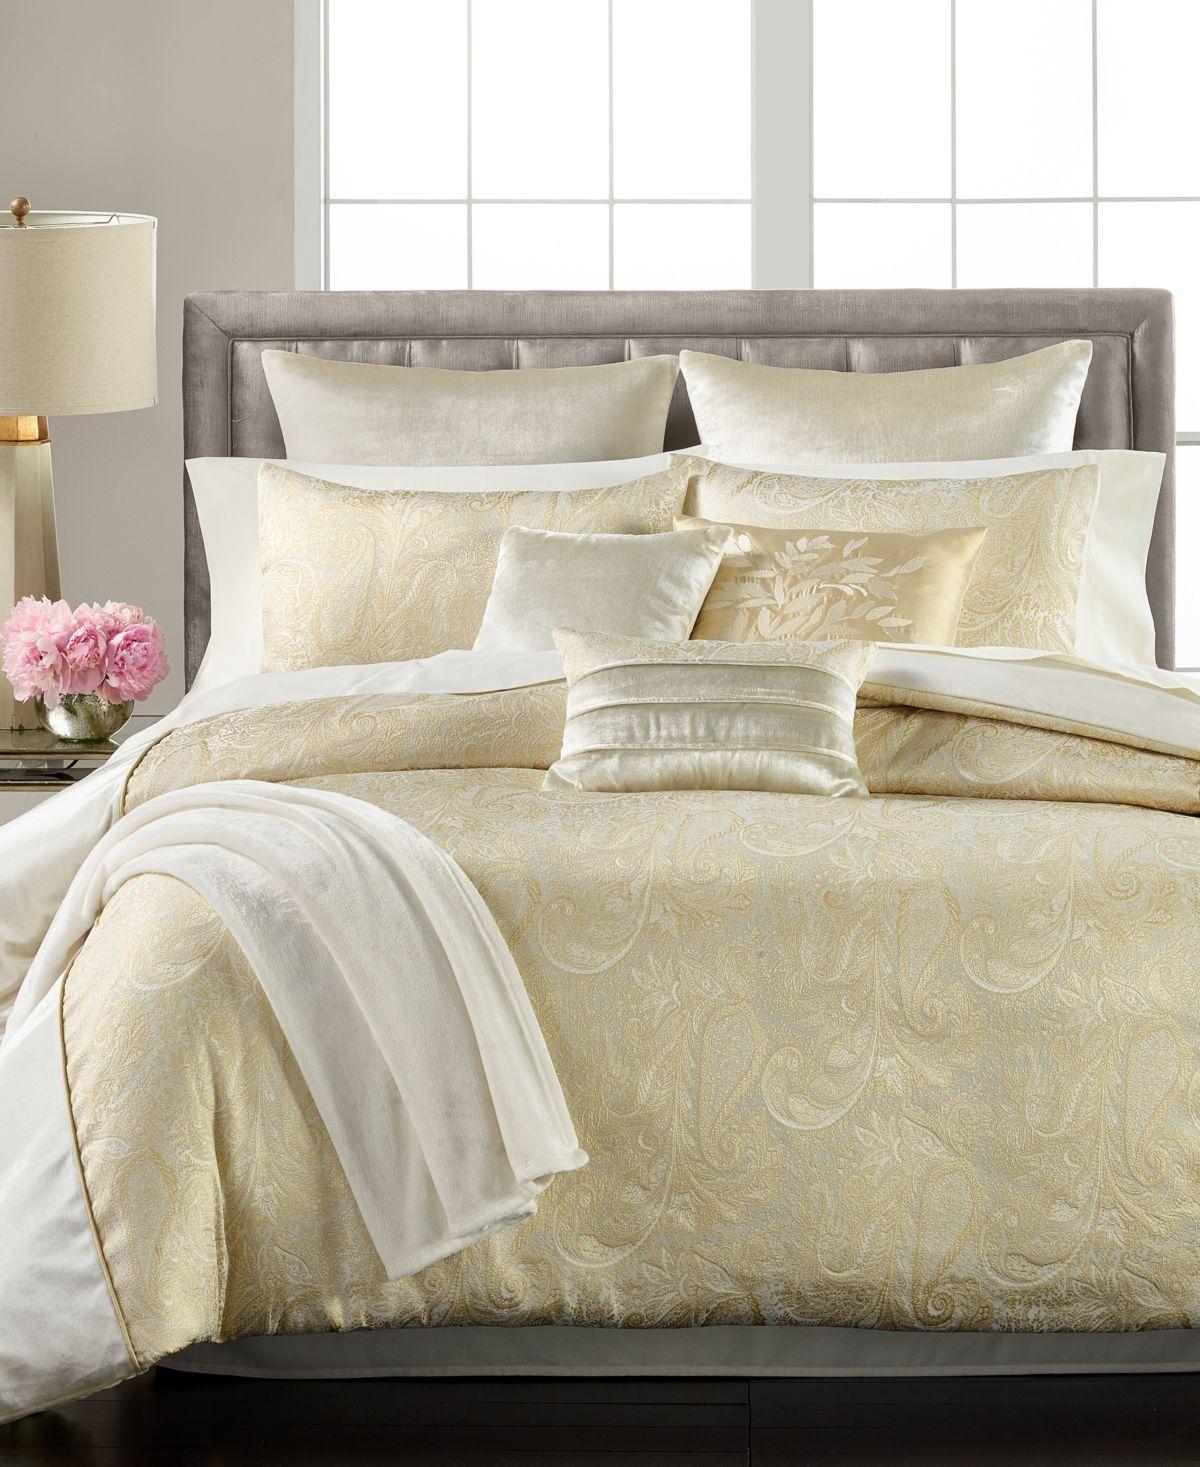 Closeout Martha Stewart Collection Velvet Paisley Jacquard 14 Pc California King Comforter Set Creat In 2021 Comforter Sets Luxury Comforter Sets Gold Comforter Set